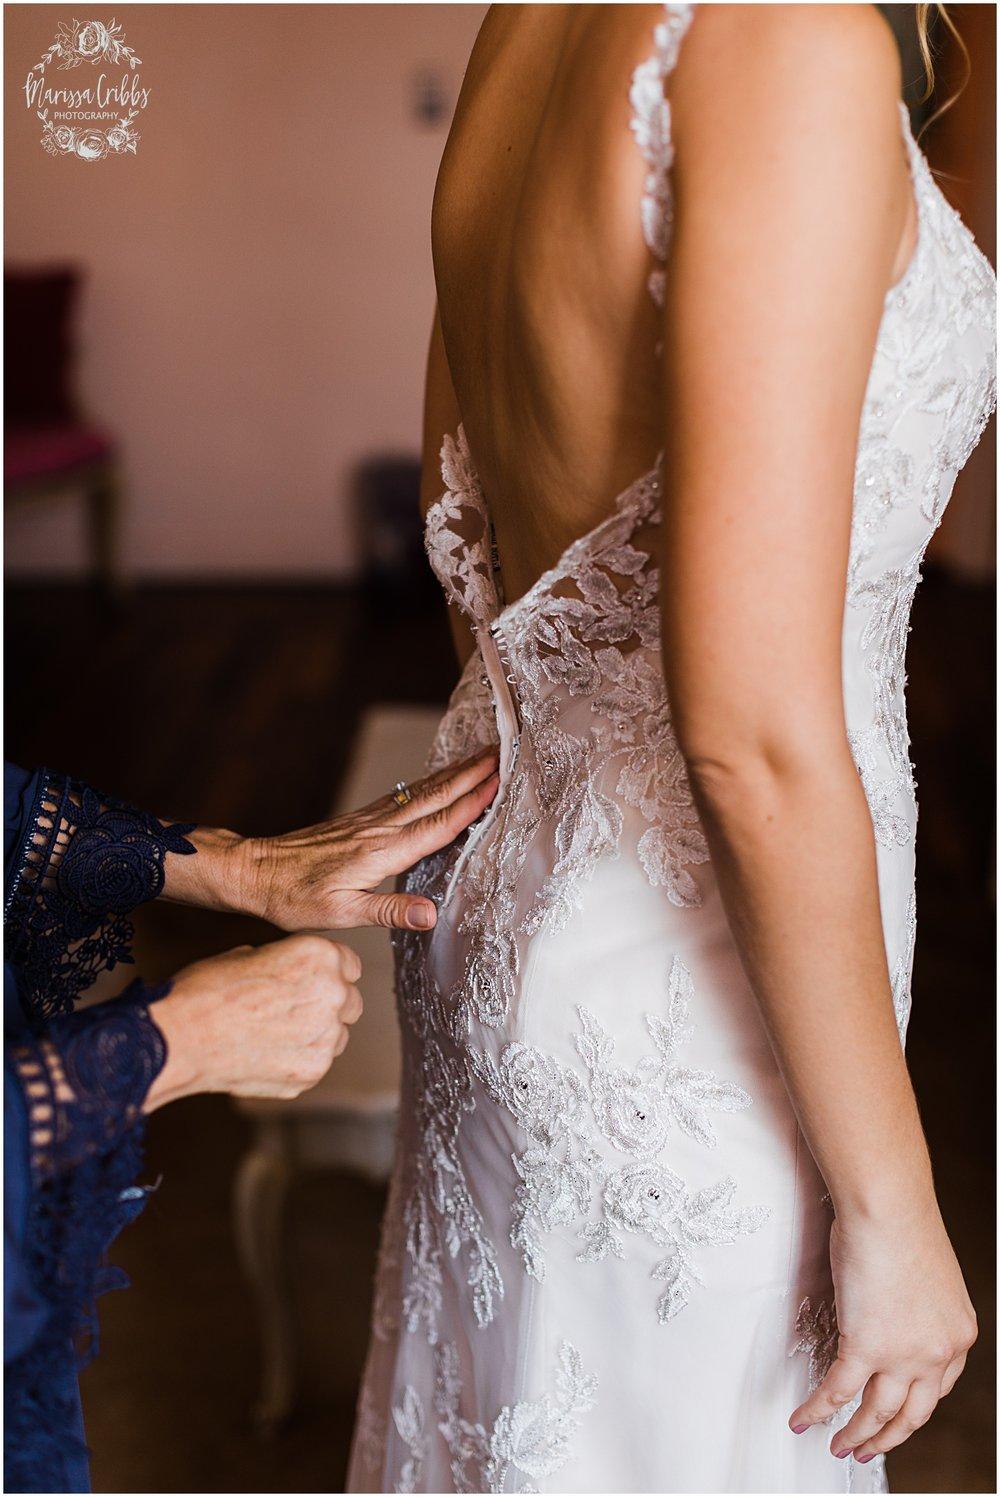 BAUER WEDDING   KELSEA & JUSTIN   MARISSA CRIBBS PHOTOGRAPHY_6491.jpg